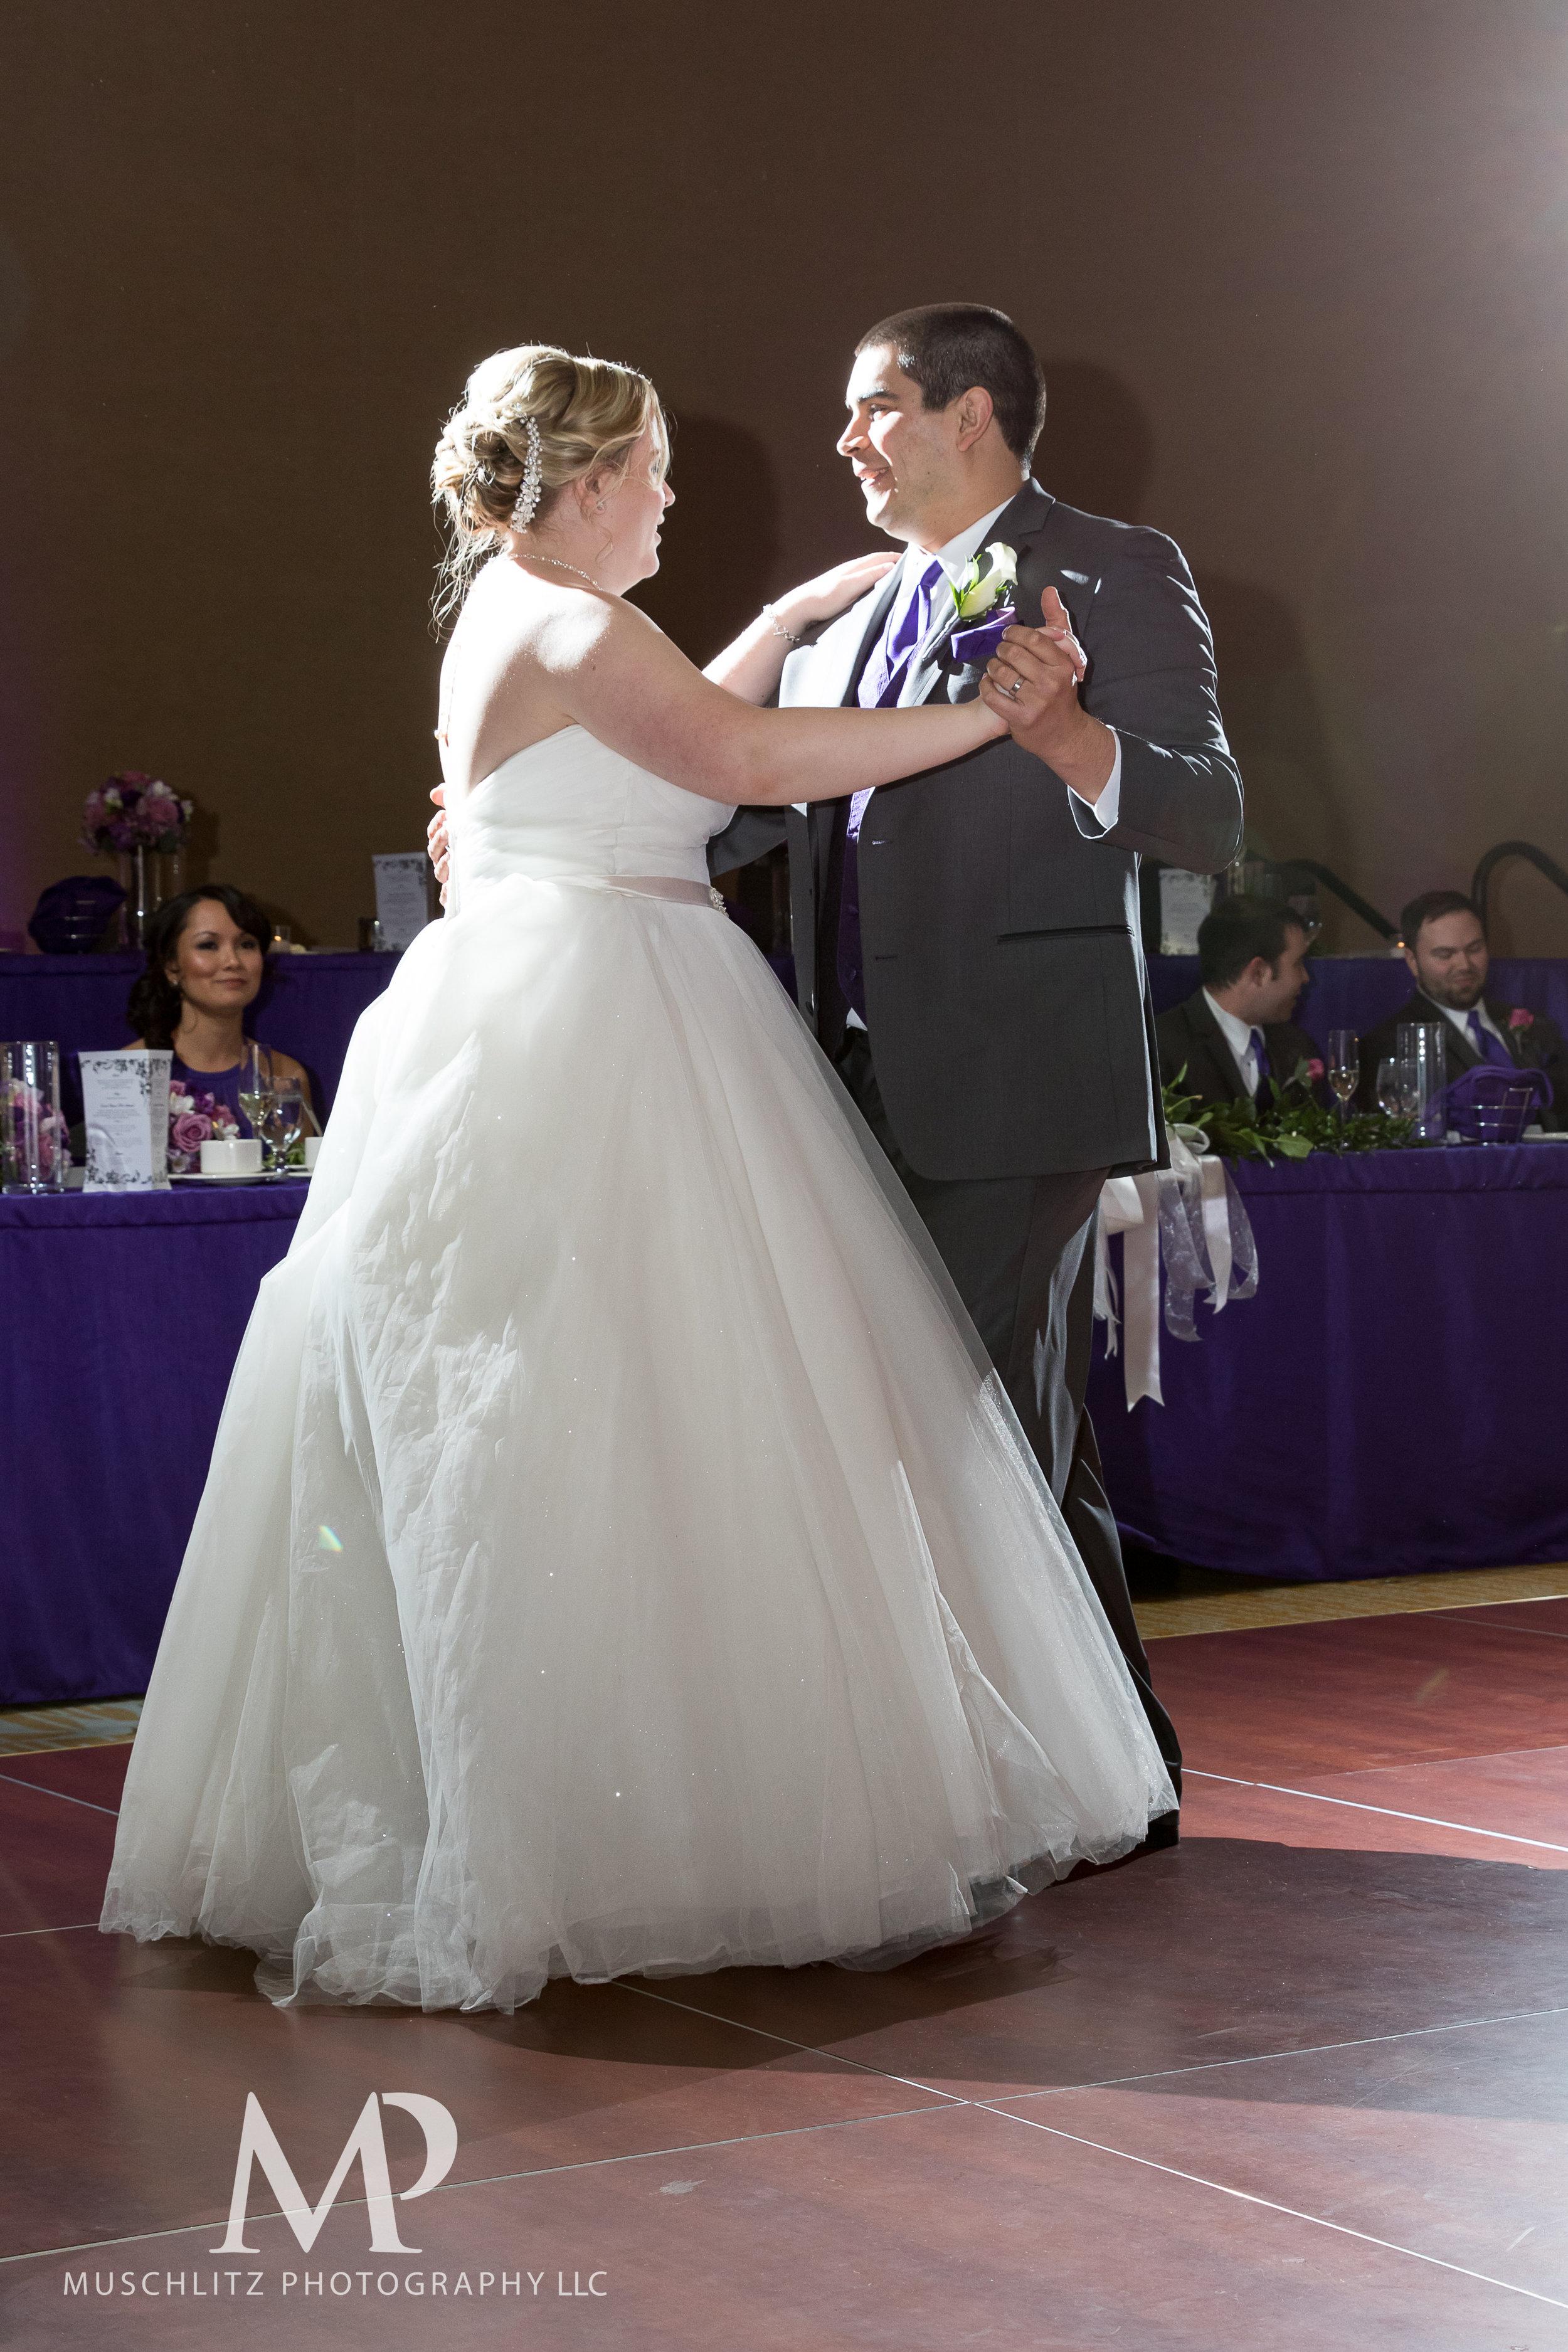 hilton-polaris-wedding-columbus-ohio-muschlitz-photography-020.JPG